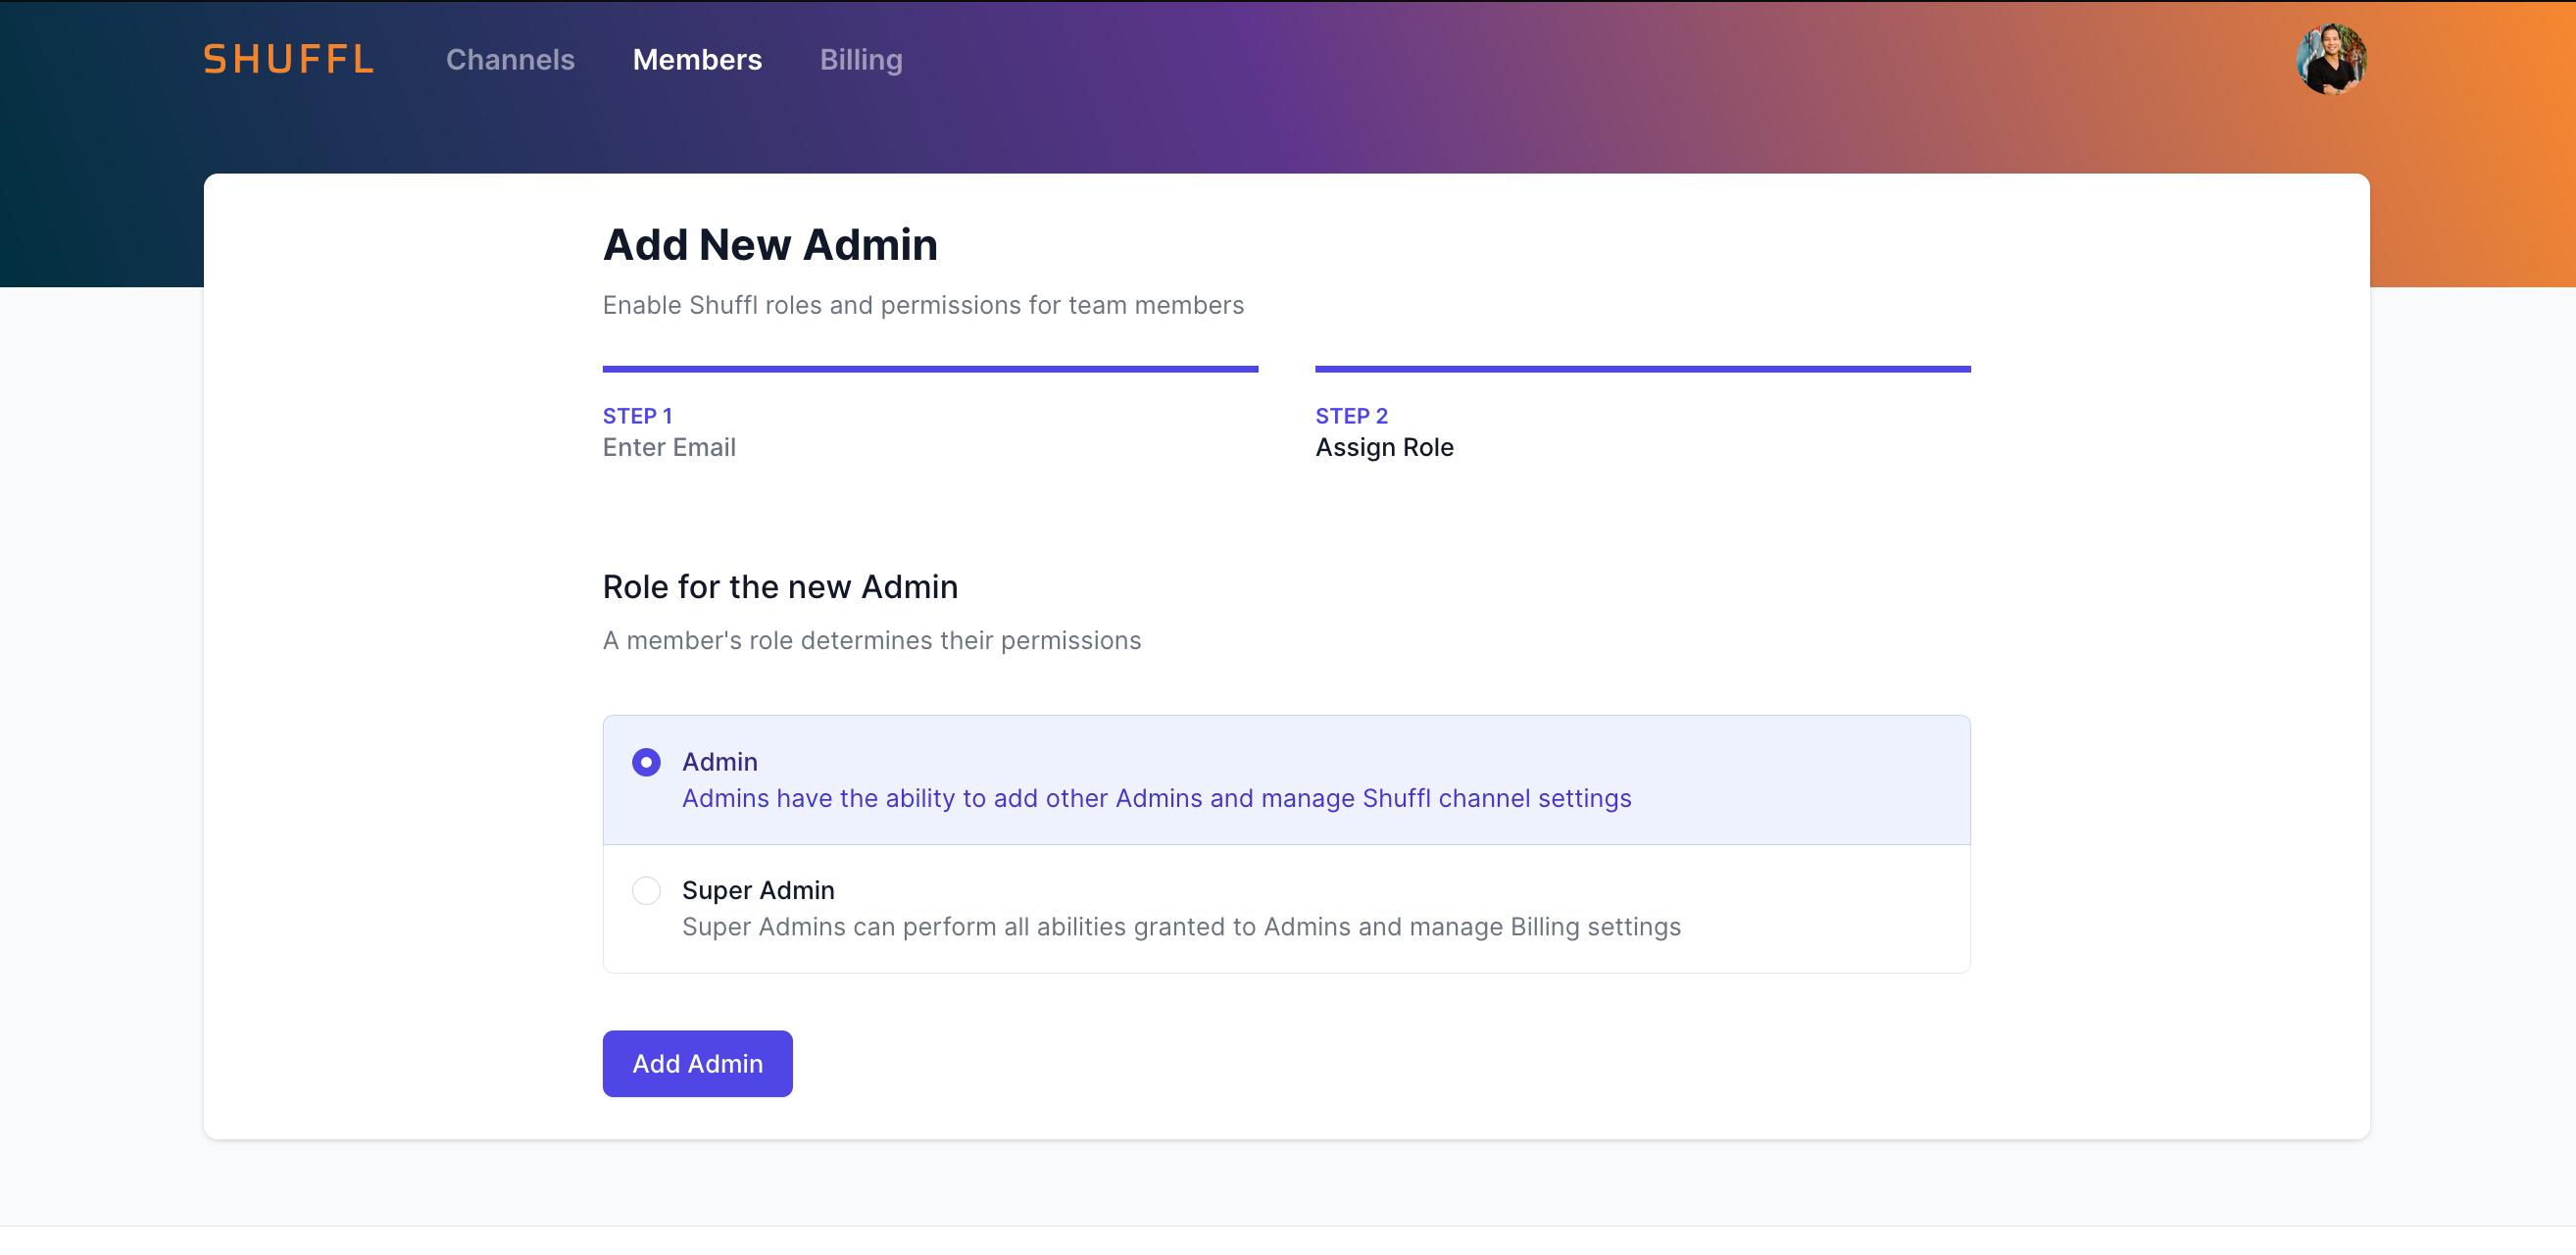 Shuffl Portal - Add Admin